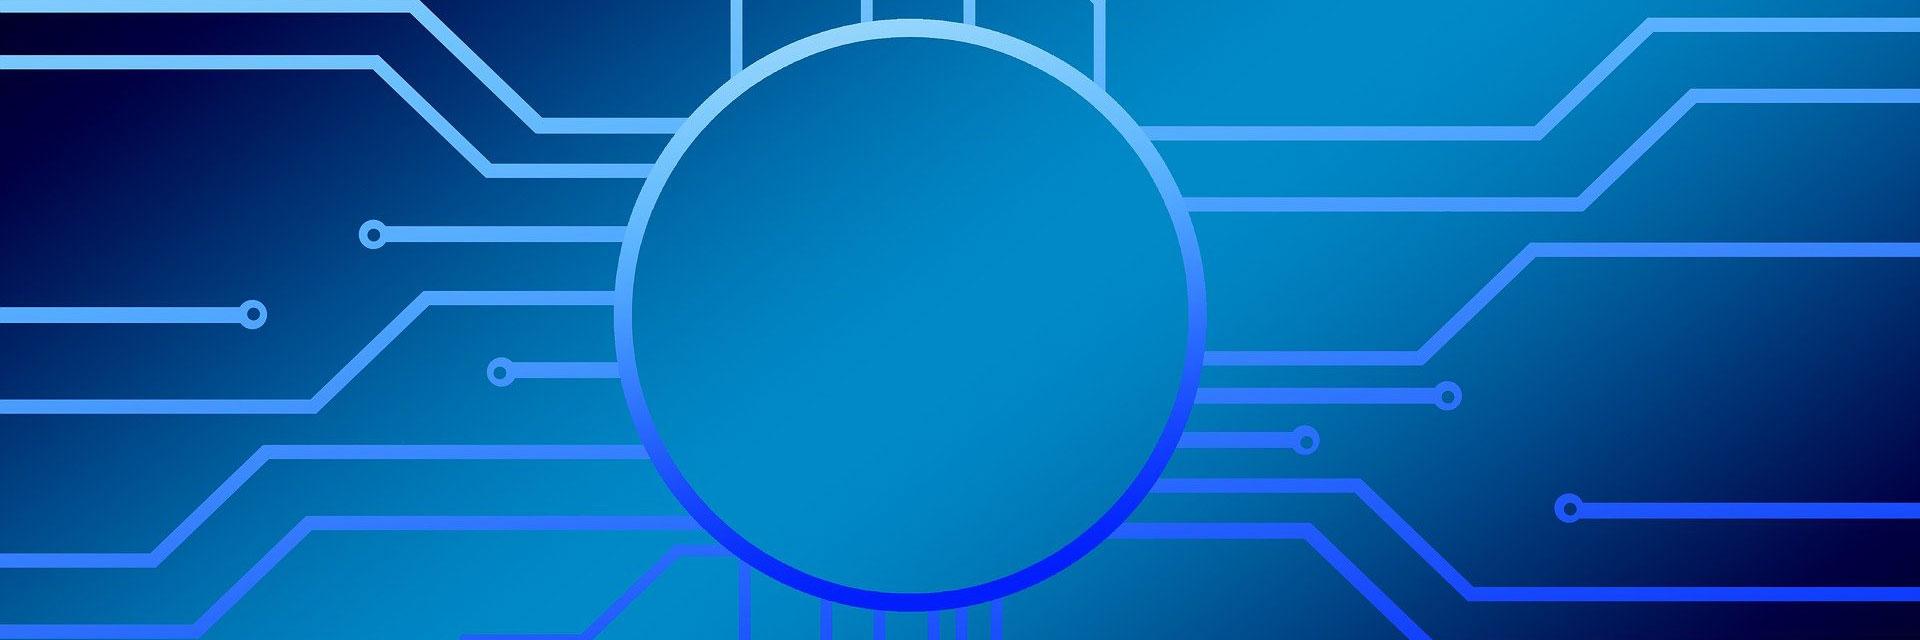 Energy Case Study: Commercial Building HVAC System Optimization